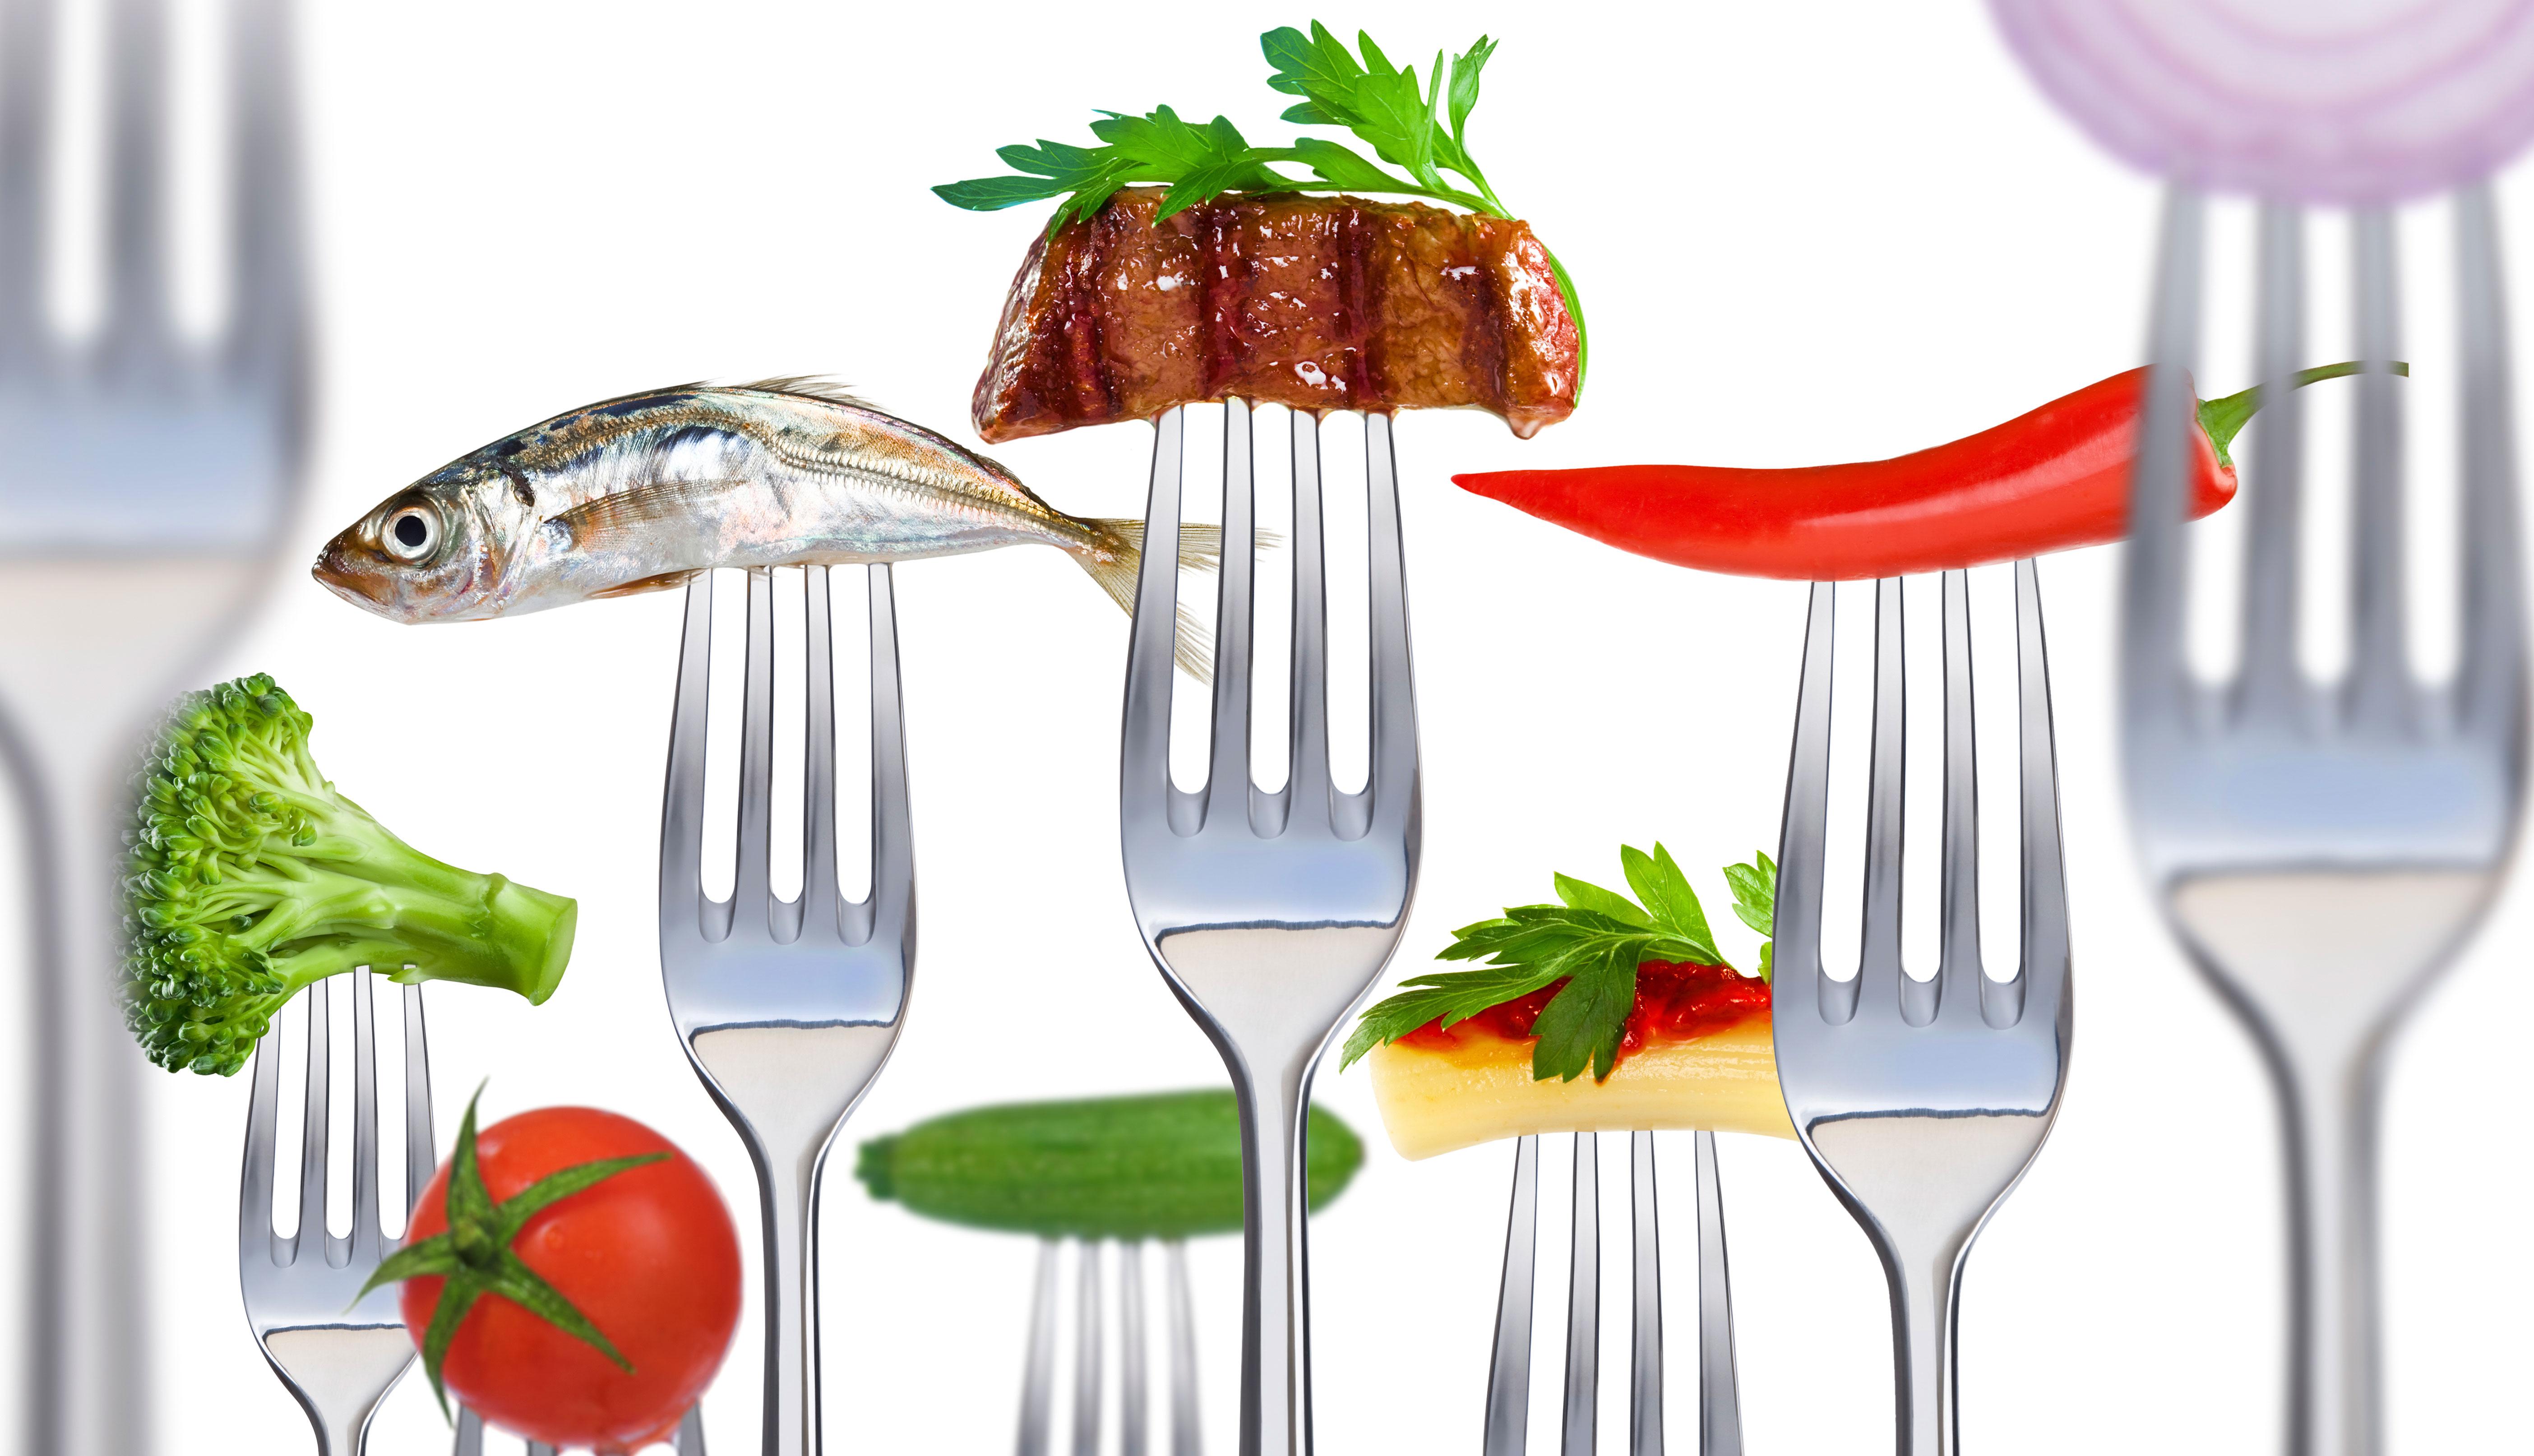 Tenedores con comida